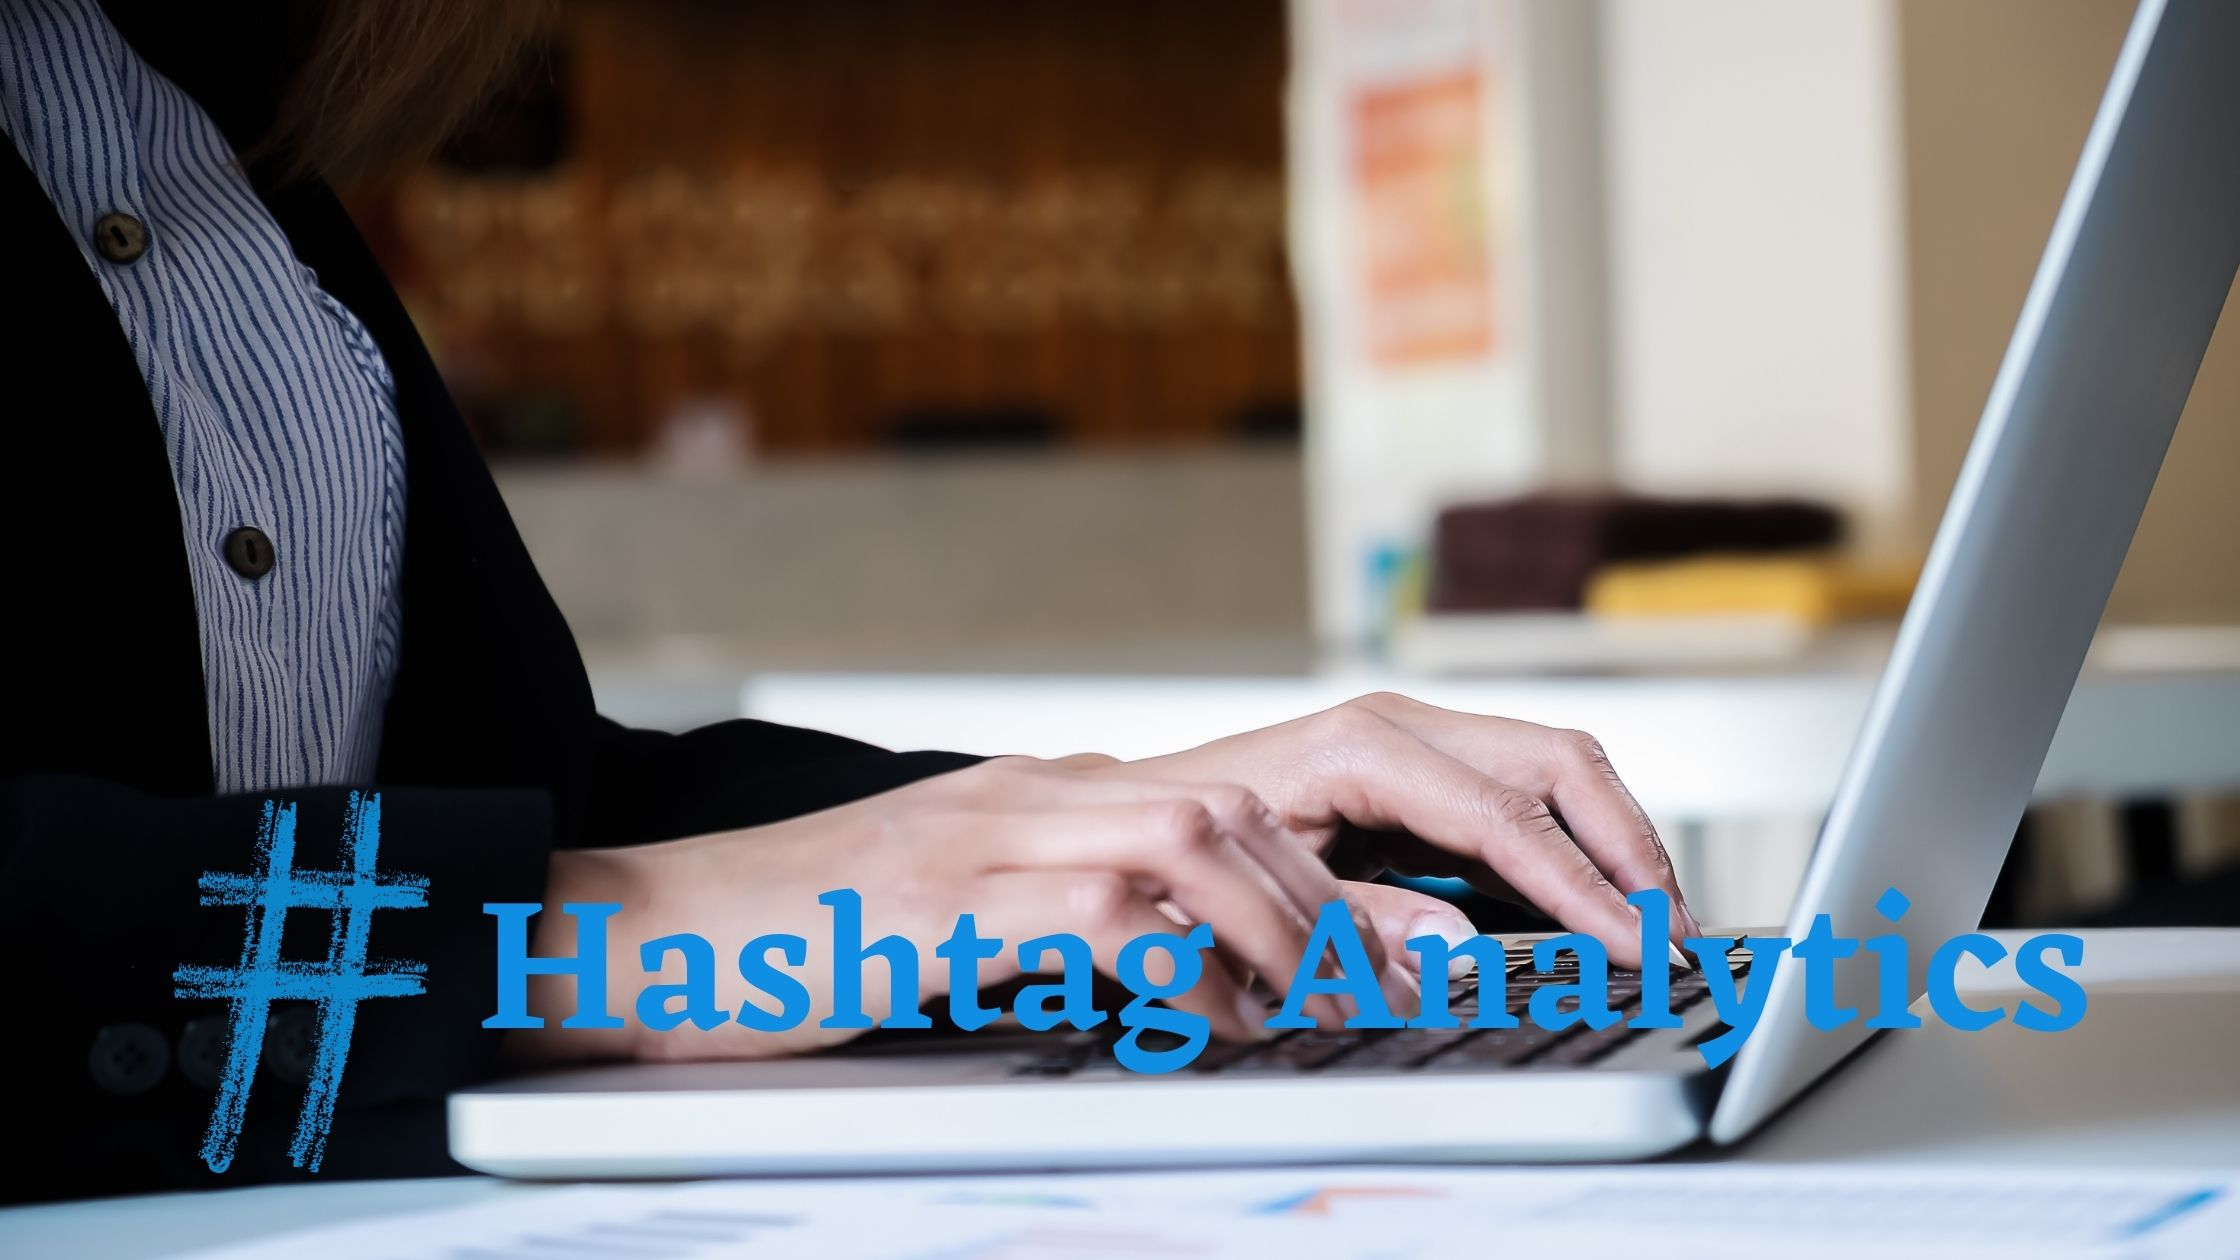 hashtag analytics blog banner